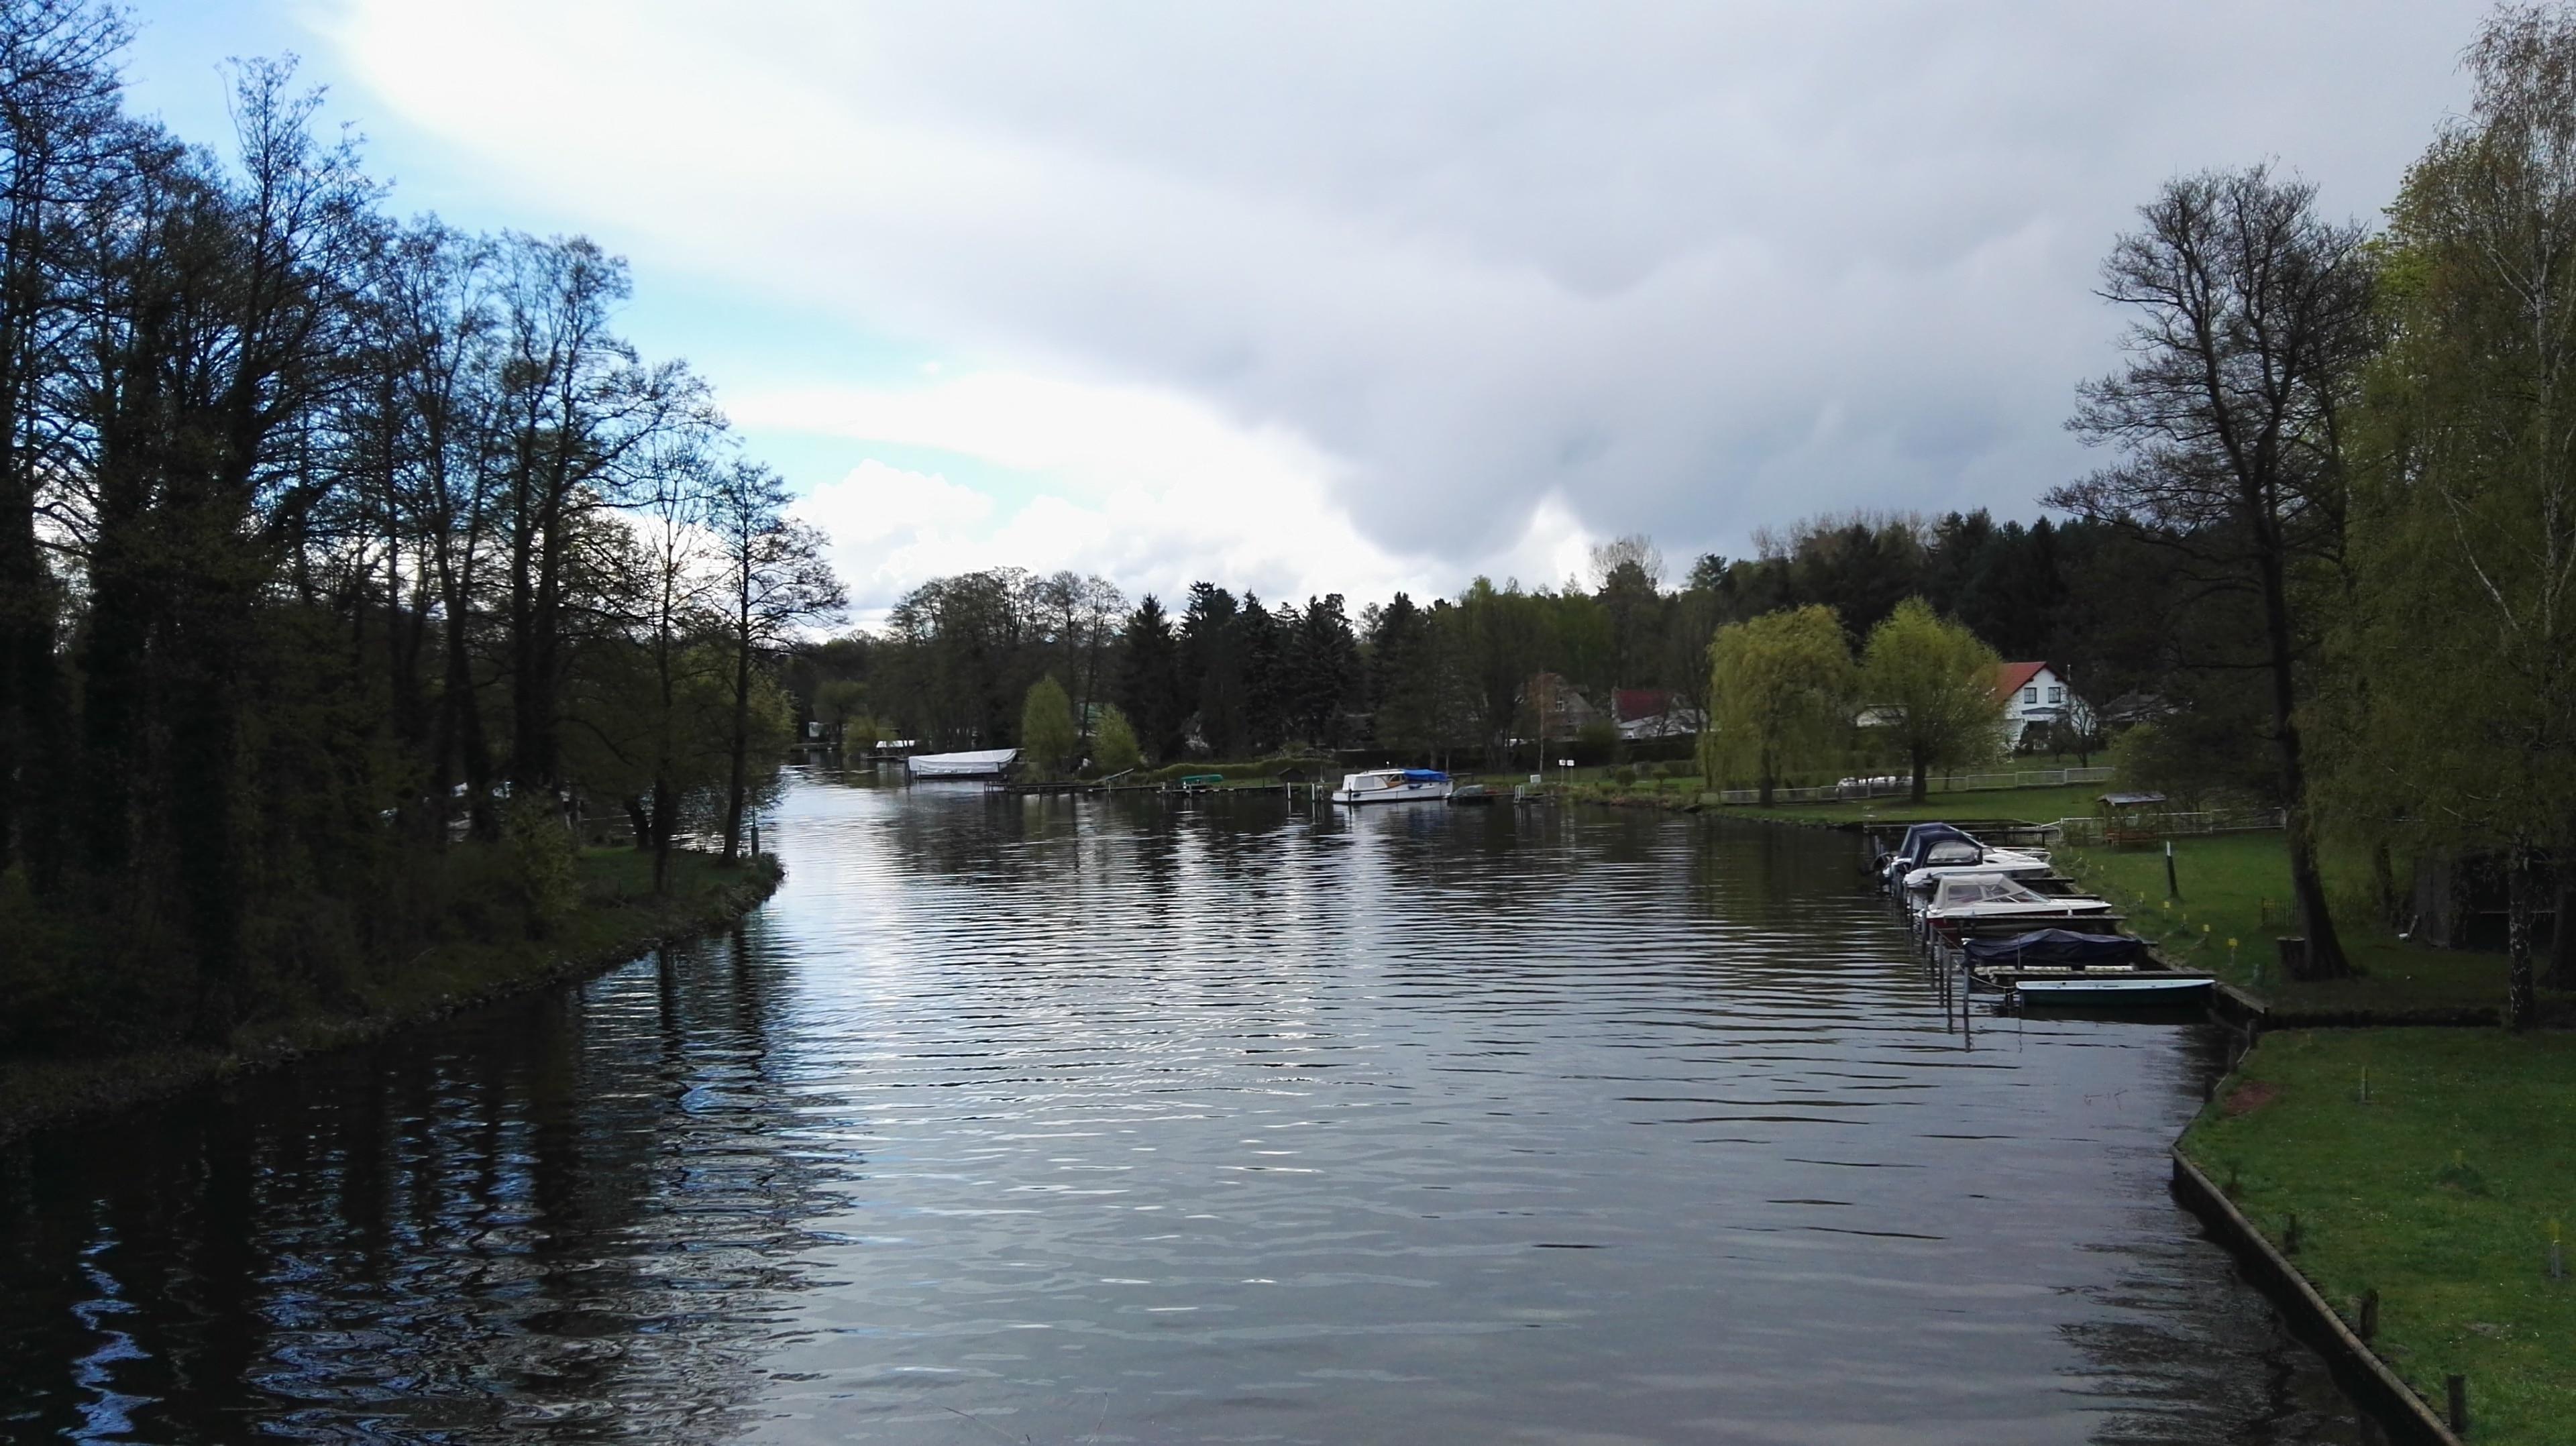 Heidesee, Brandenburg Region, Germany